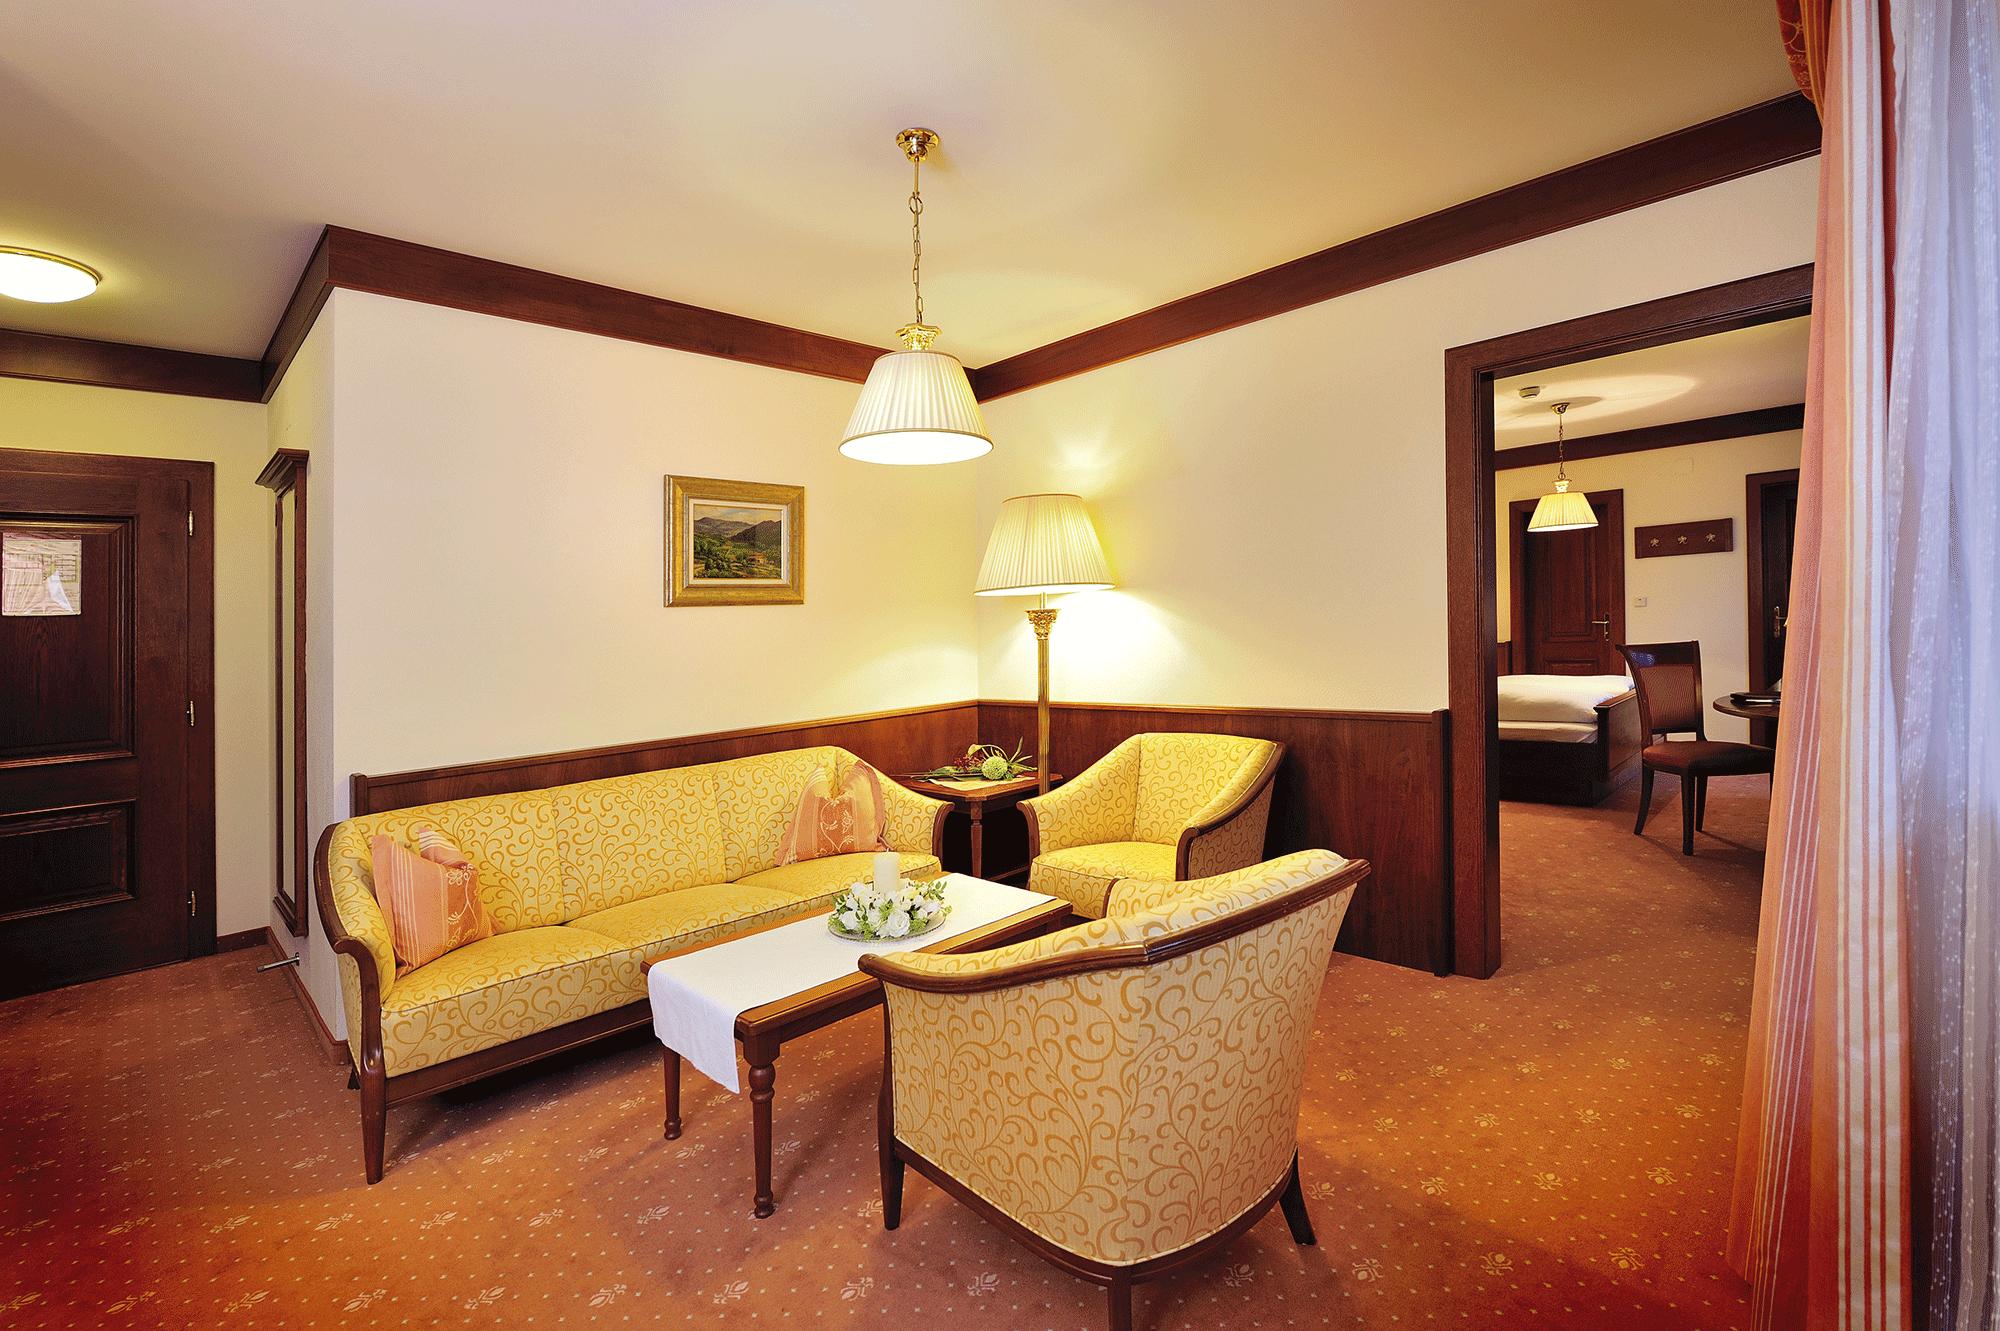 Panoramasuite Sitzecke im Wellnesshotel Alpbacherhof in Tirol